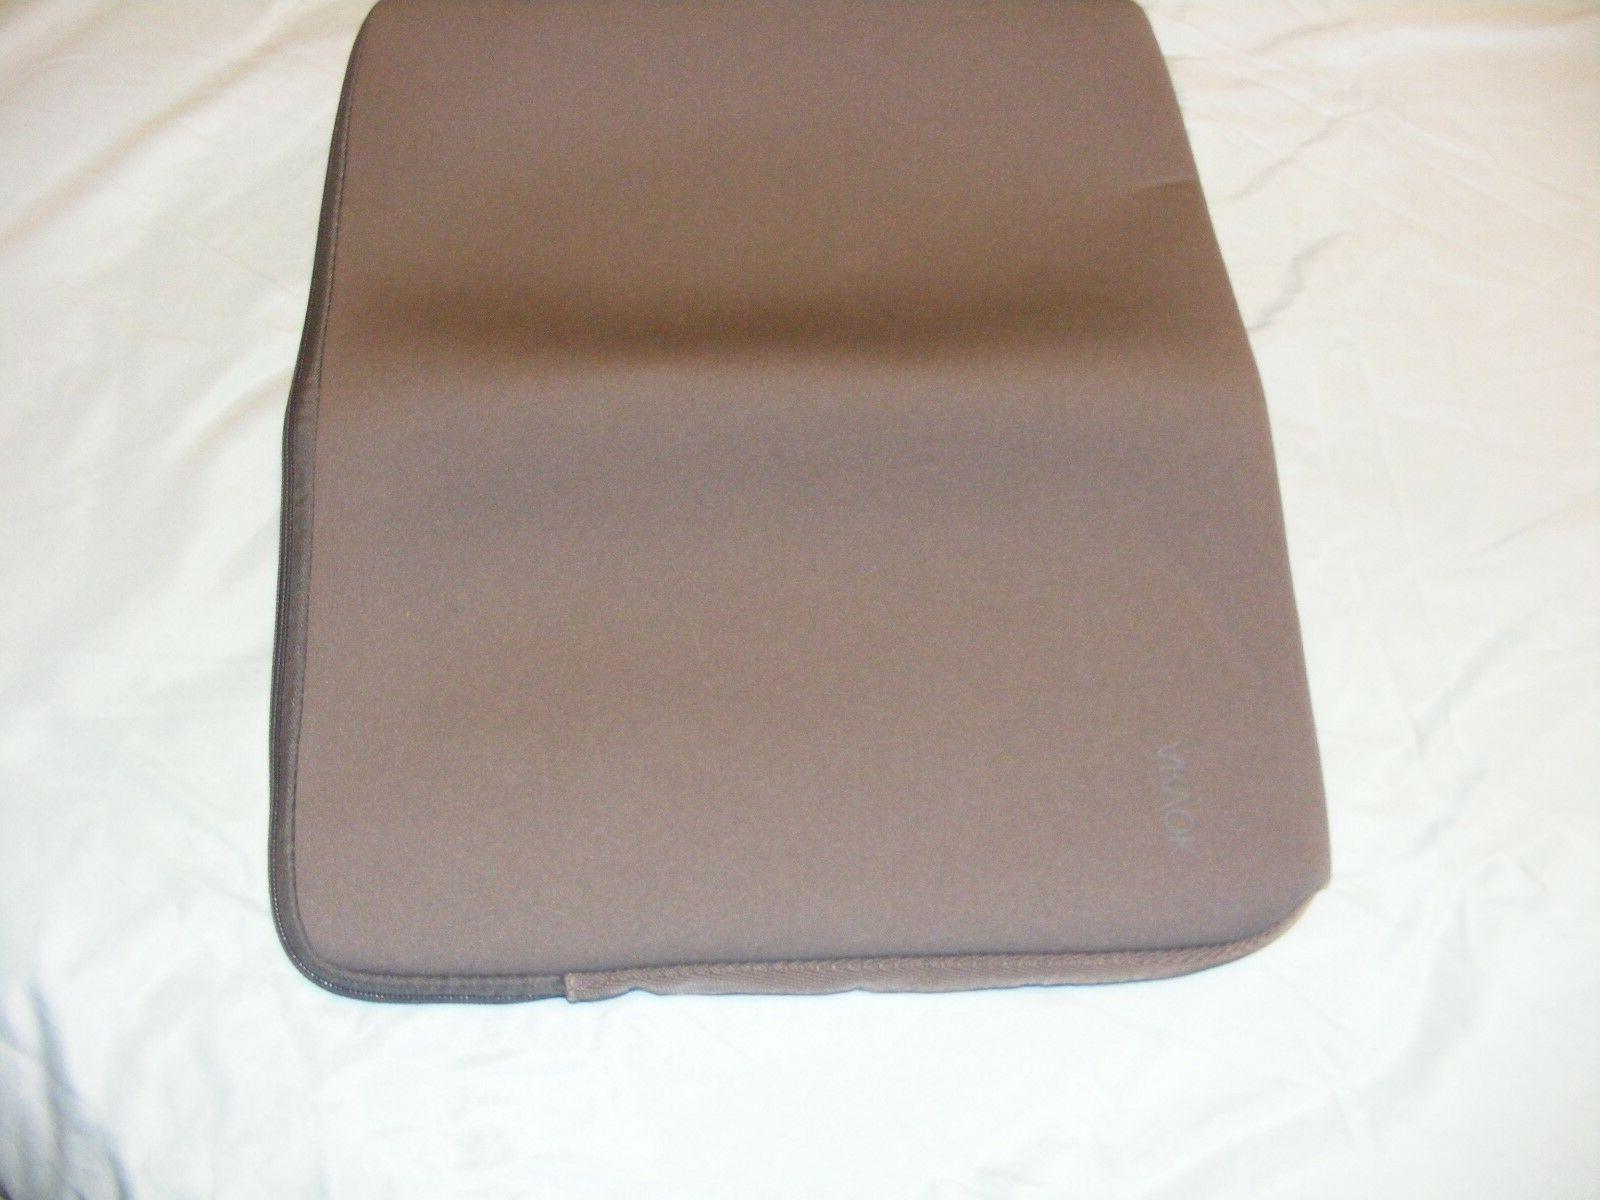 Arvok Sleeve Case- Water-resistant, New, Shipping